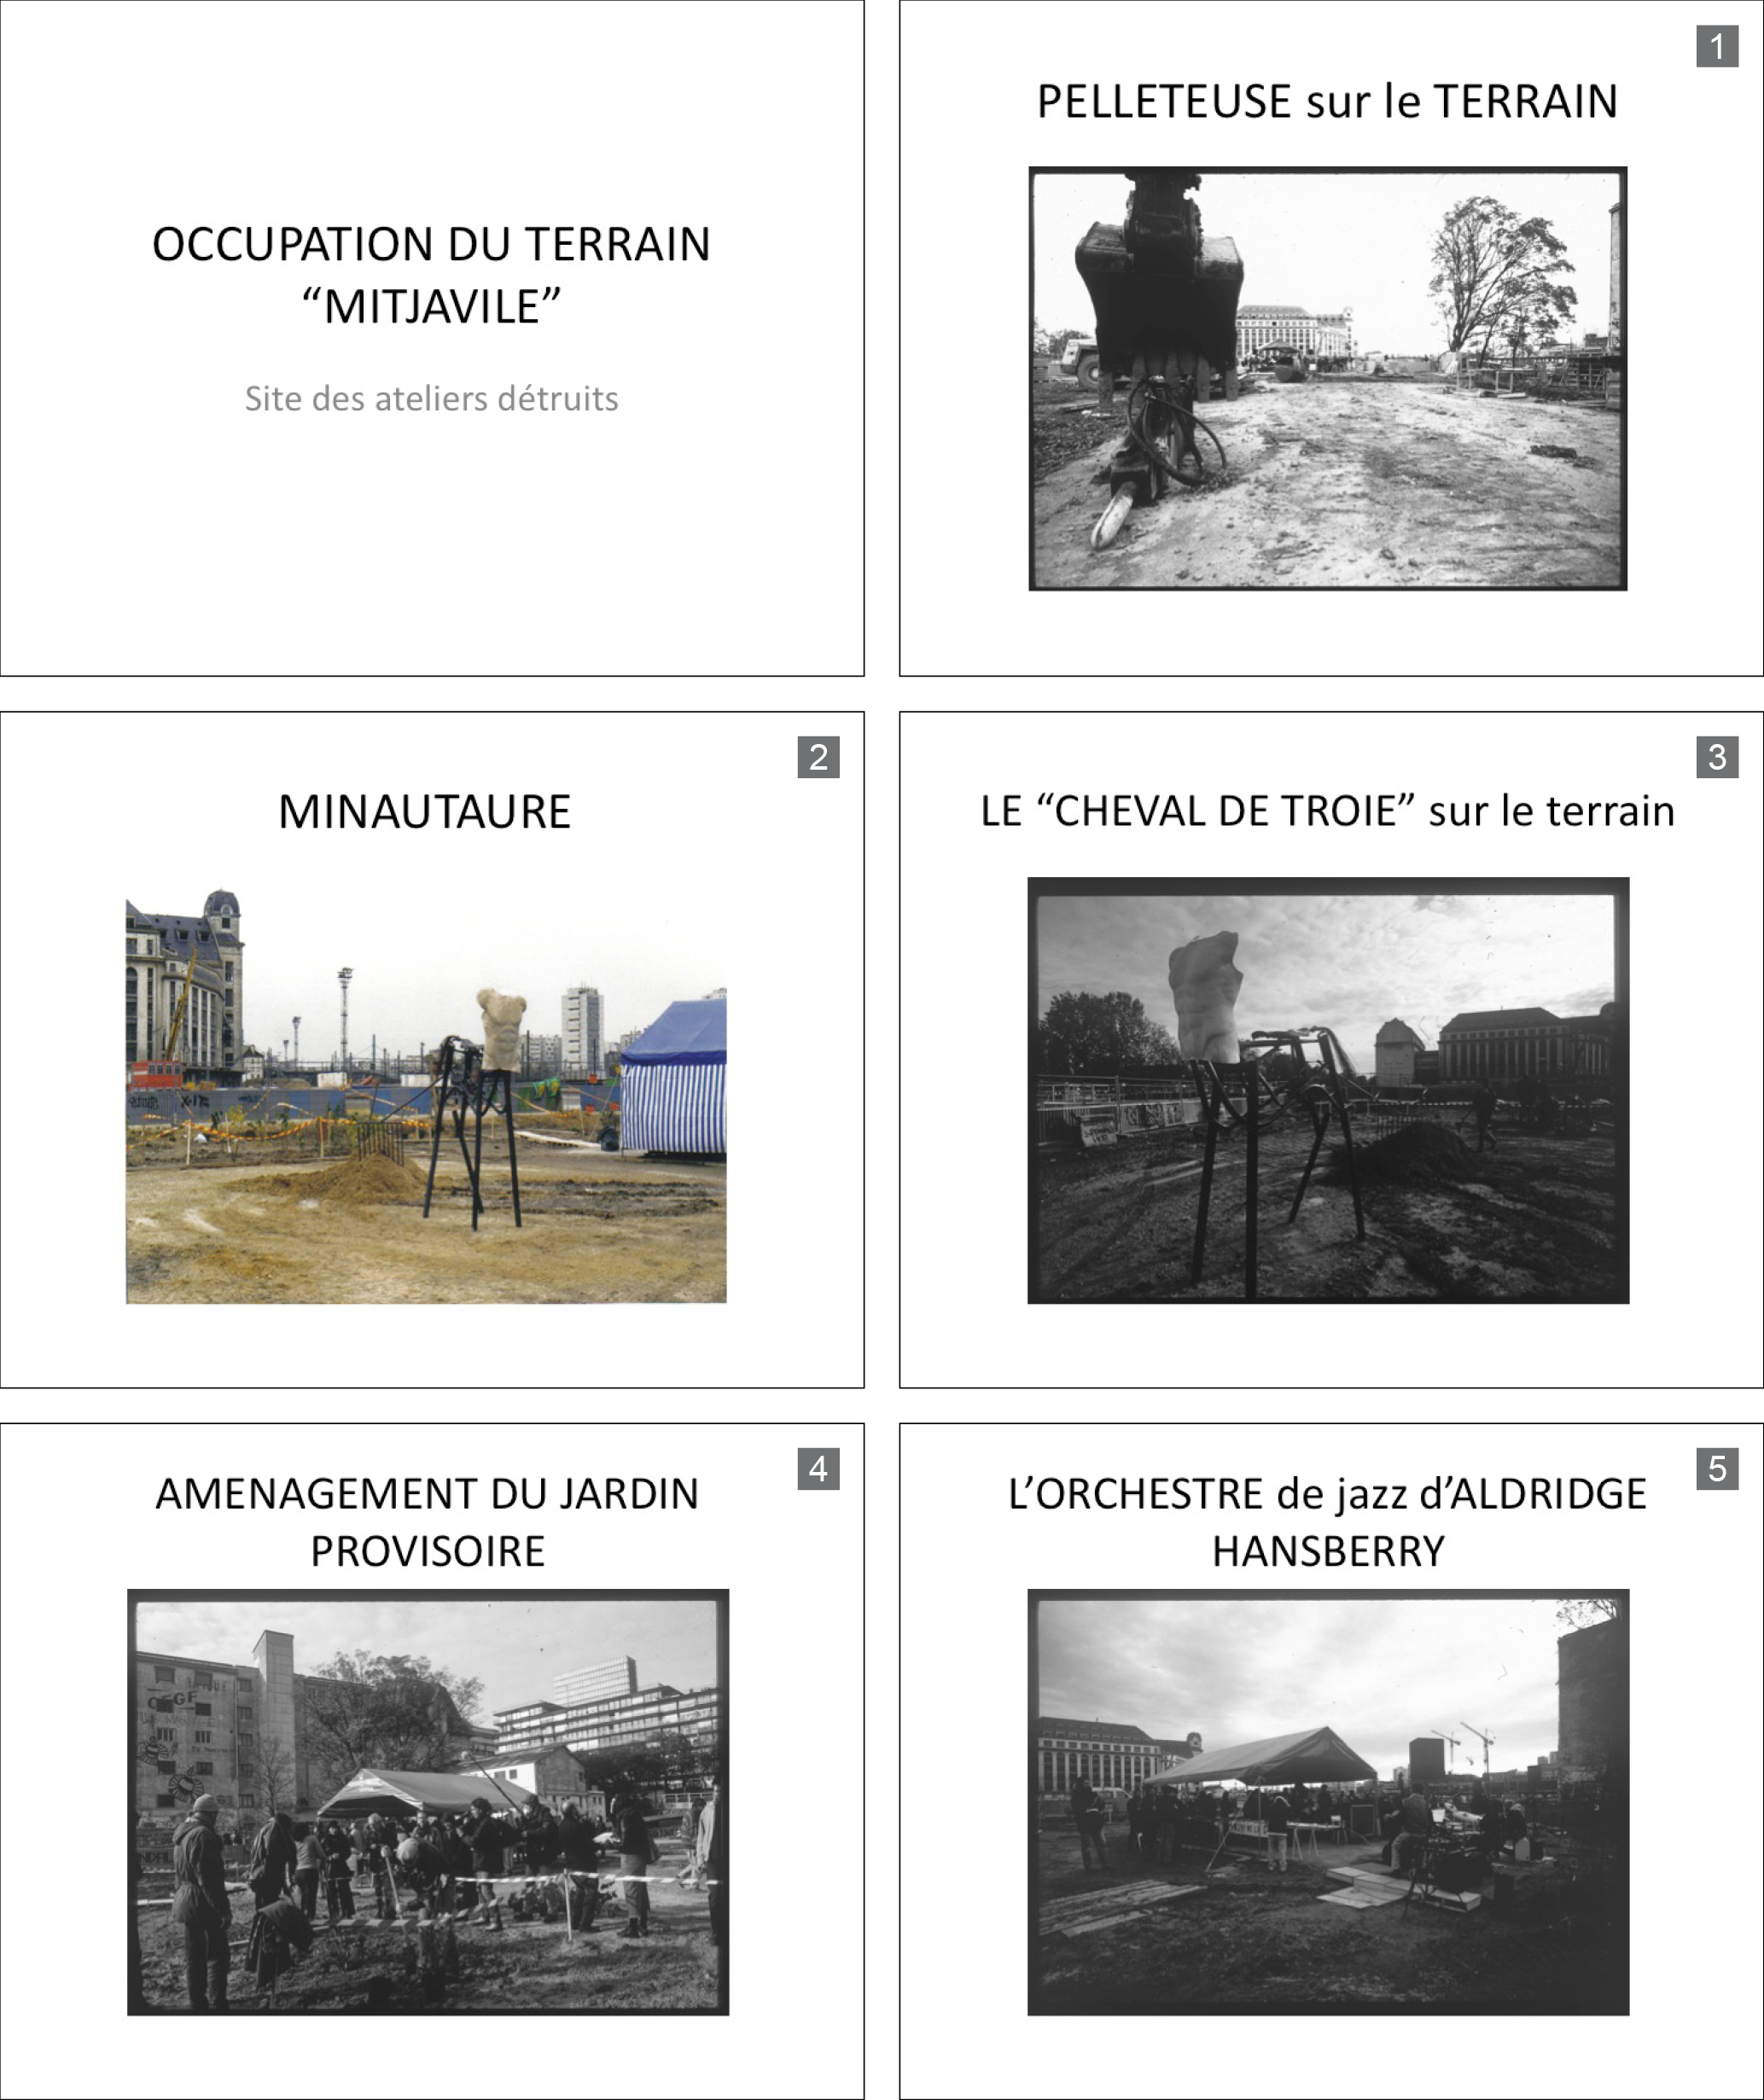 occupation_terrain